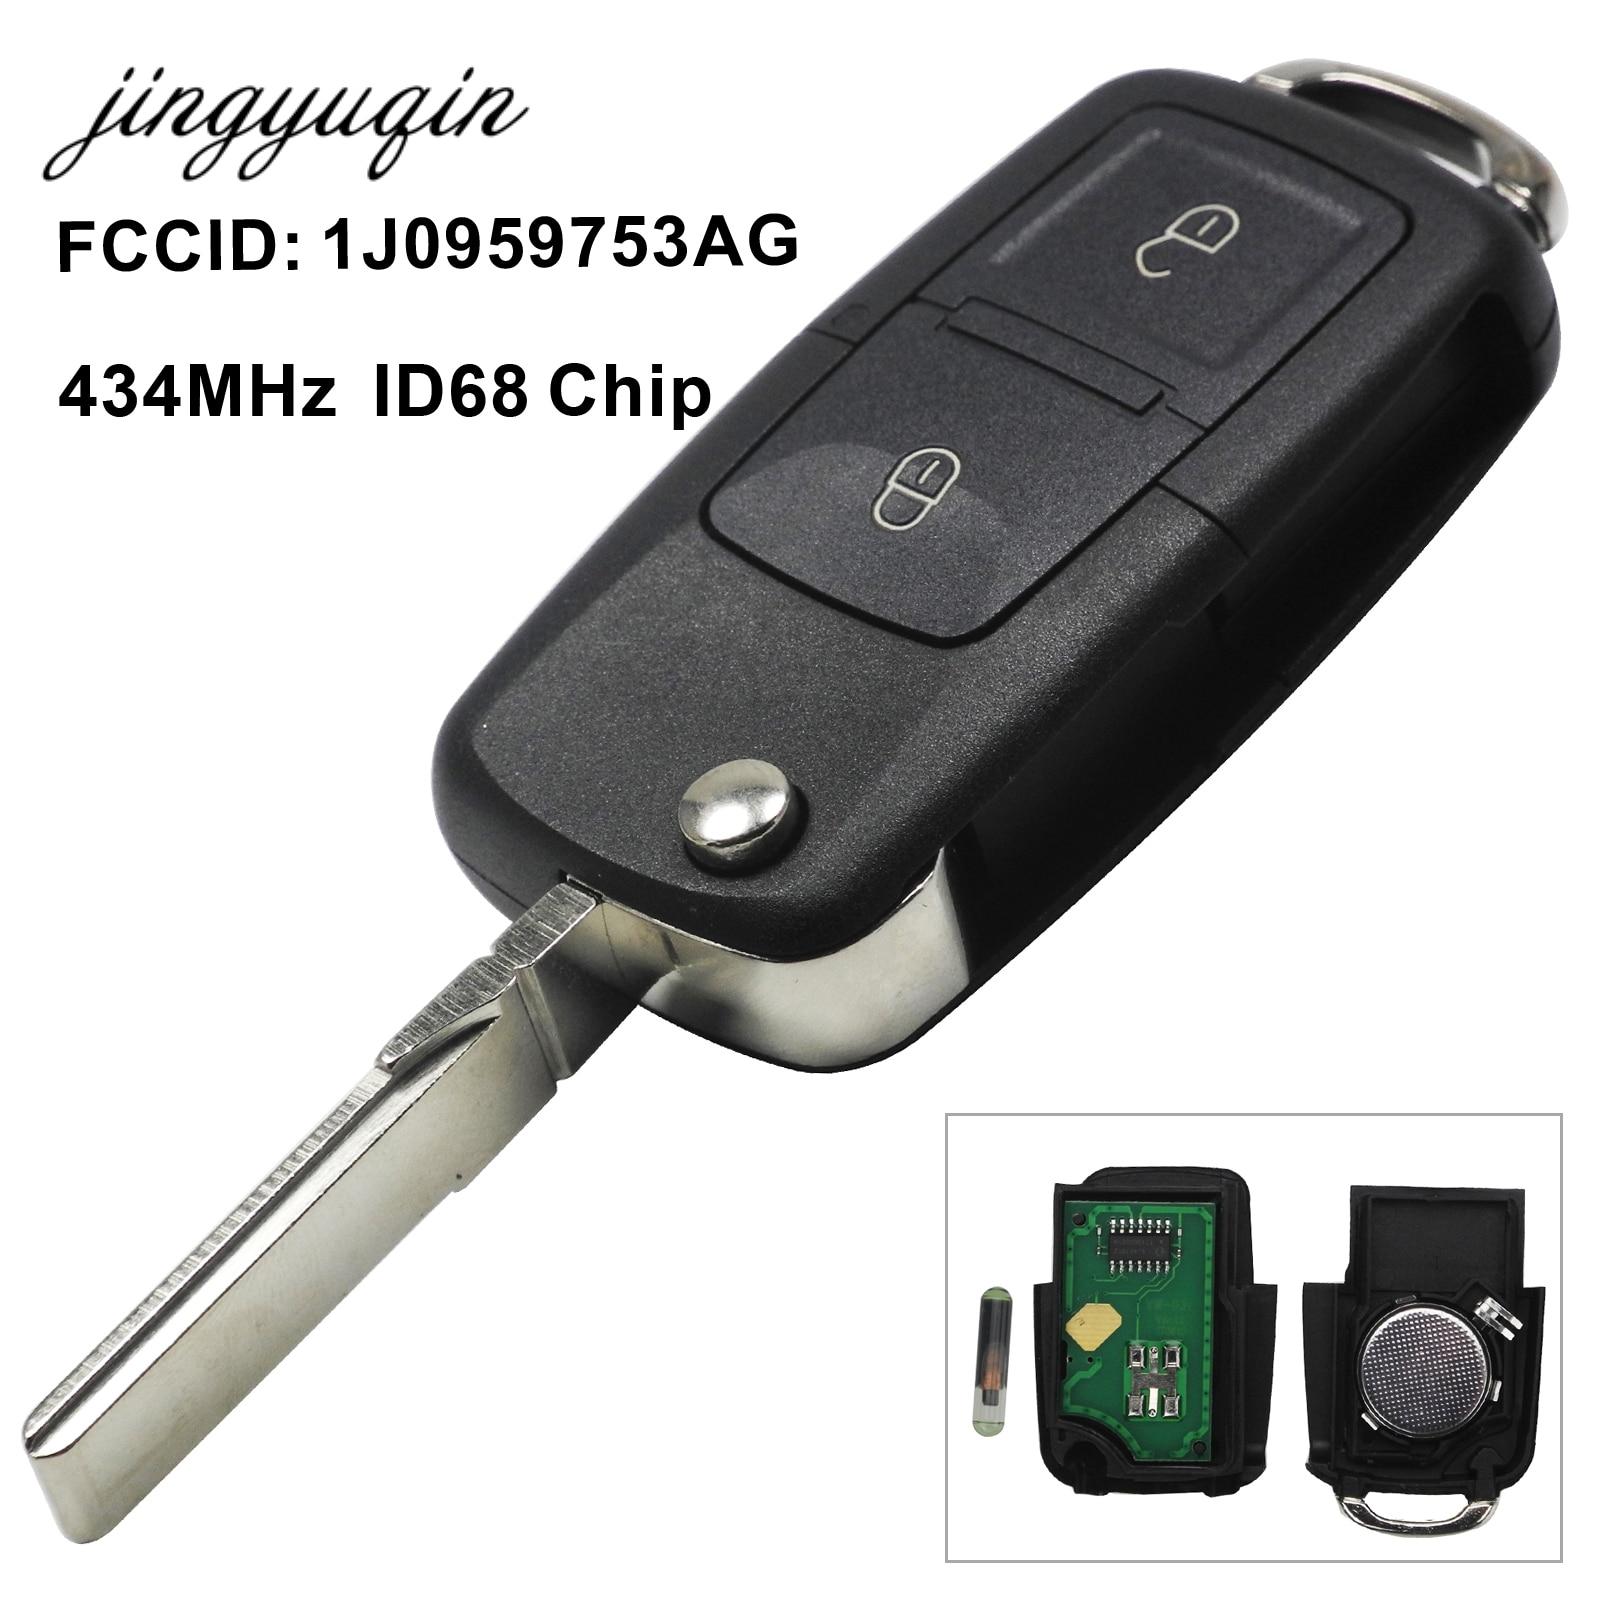 Jingyuqin 2/3/4 Taste Flip Remote Key Fob 434 mhz ID48 Chip Für VW Beetle Bora Golf passat Polo Transporter T5 1J0 959 753 AG